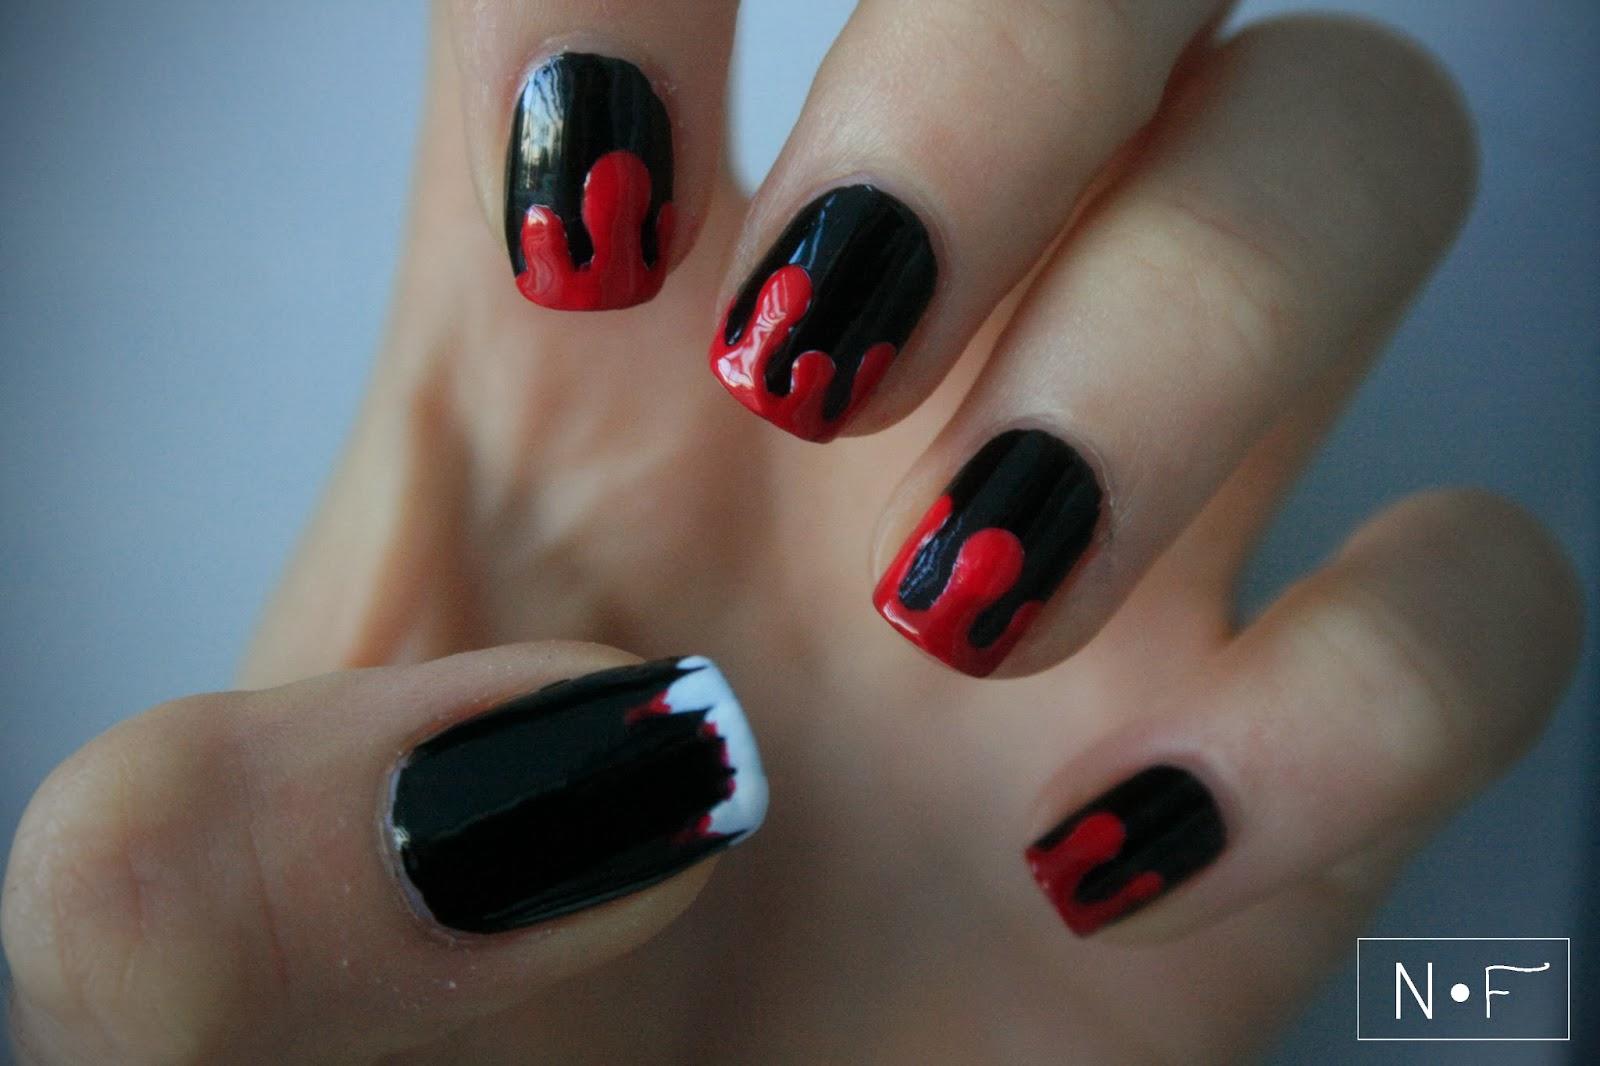 http://nerdyfleurty.blogspot.com/2013/10/vampire-nails.html